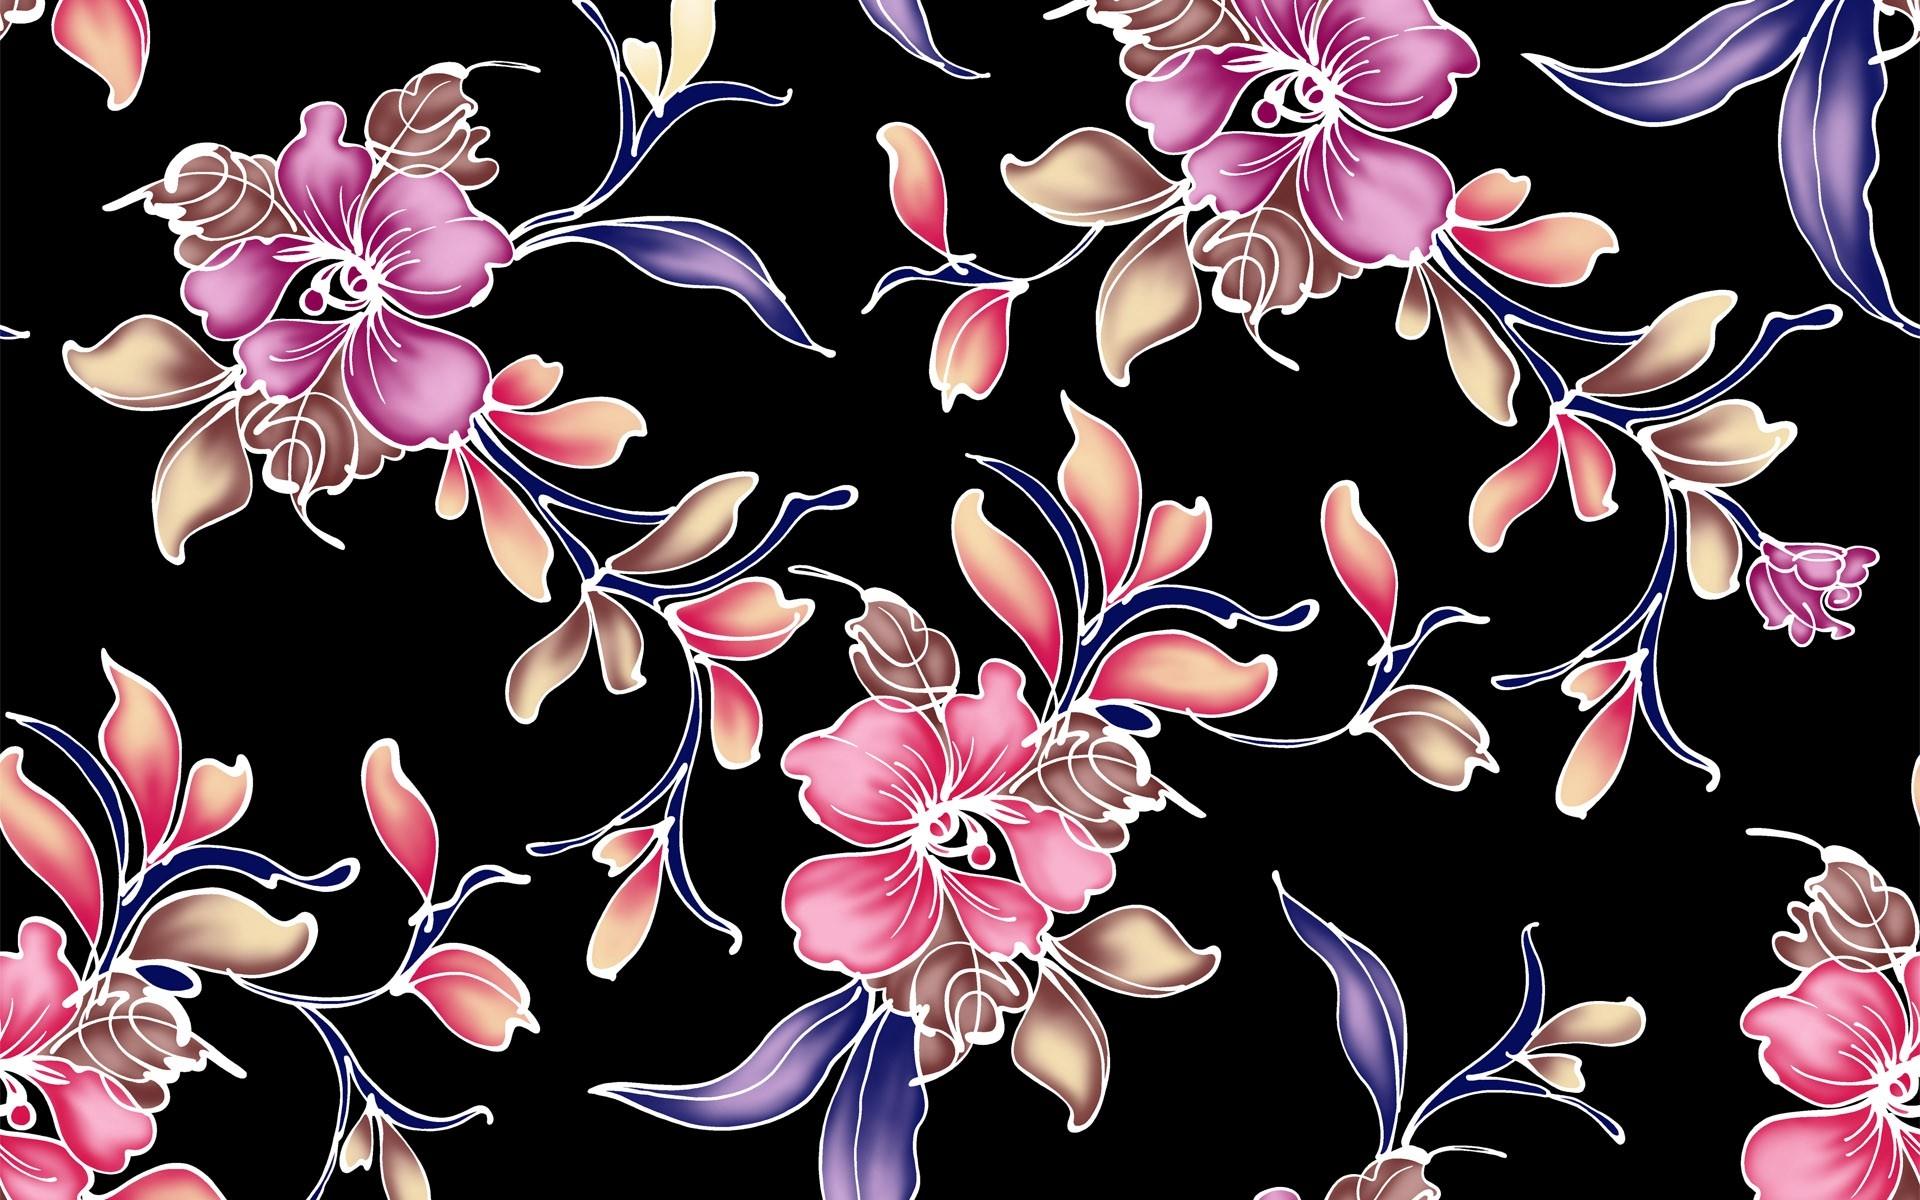 Wallpaper Illustration Dark Flowers Purple Cherry Blossom